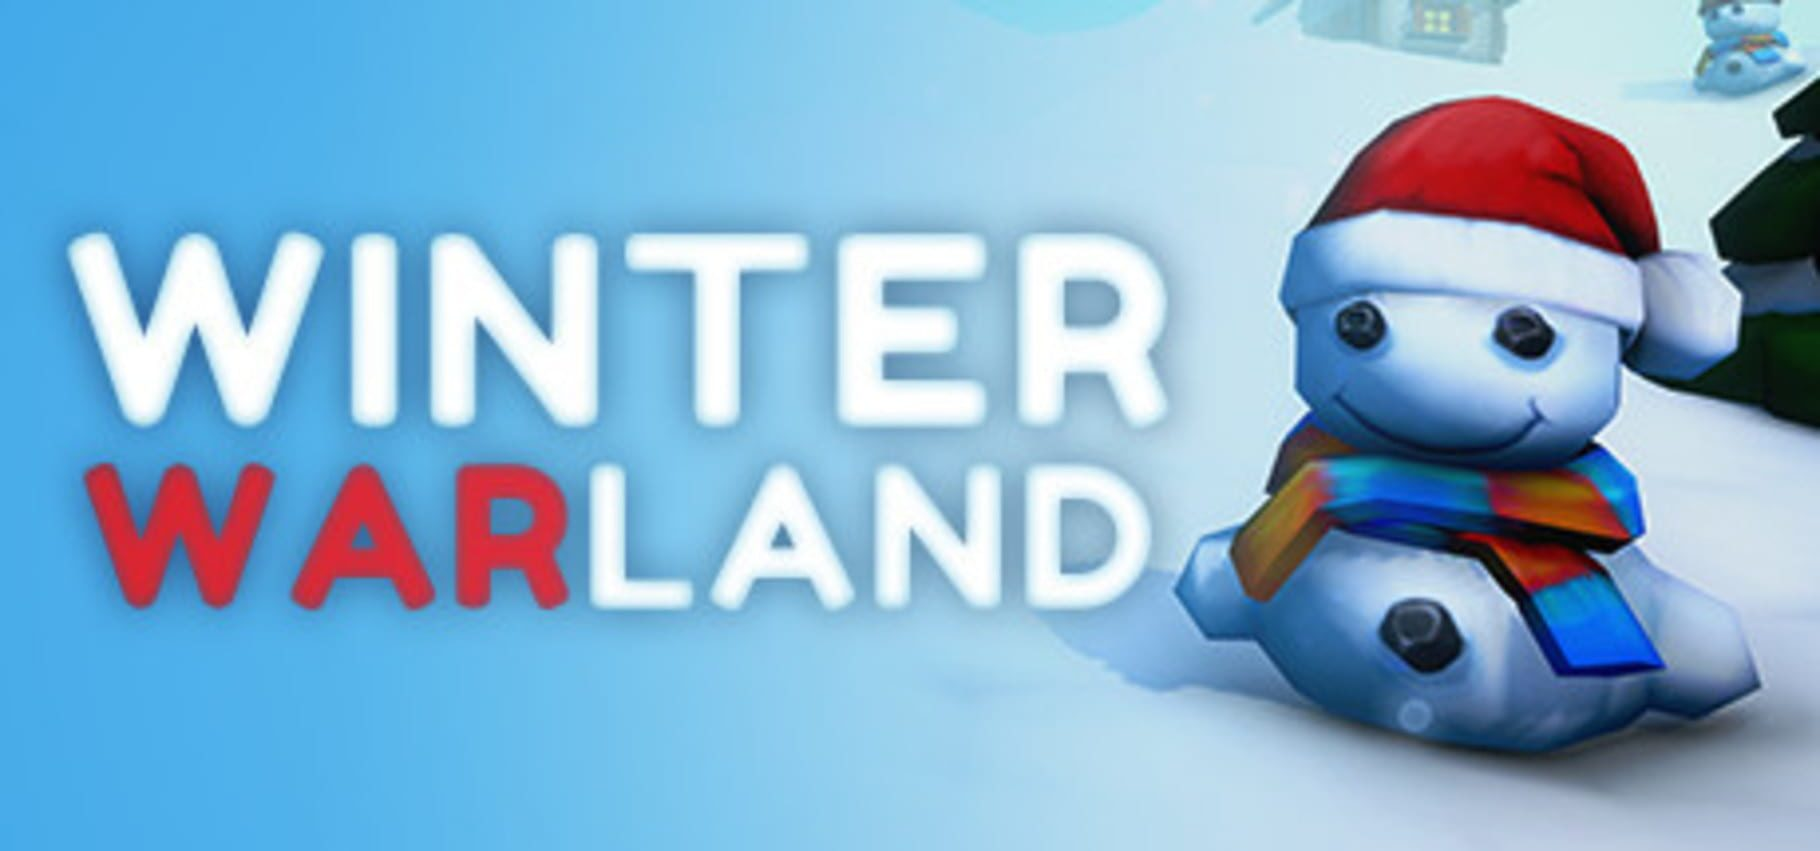 buy Winter Warland cd key for all platform